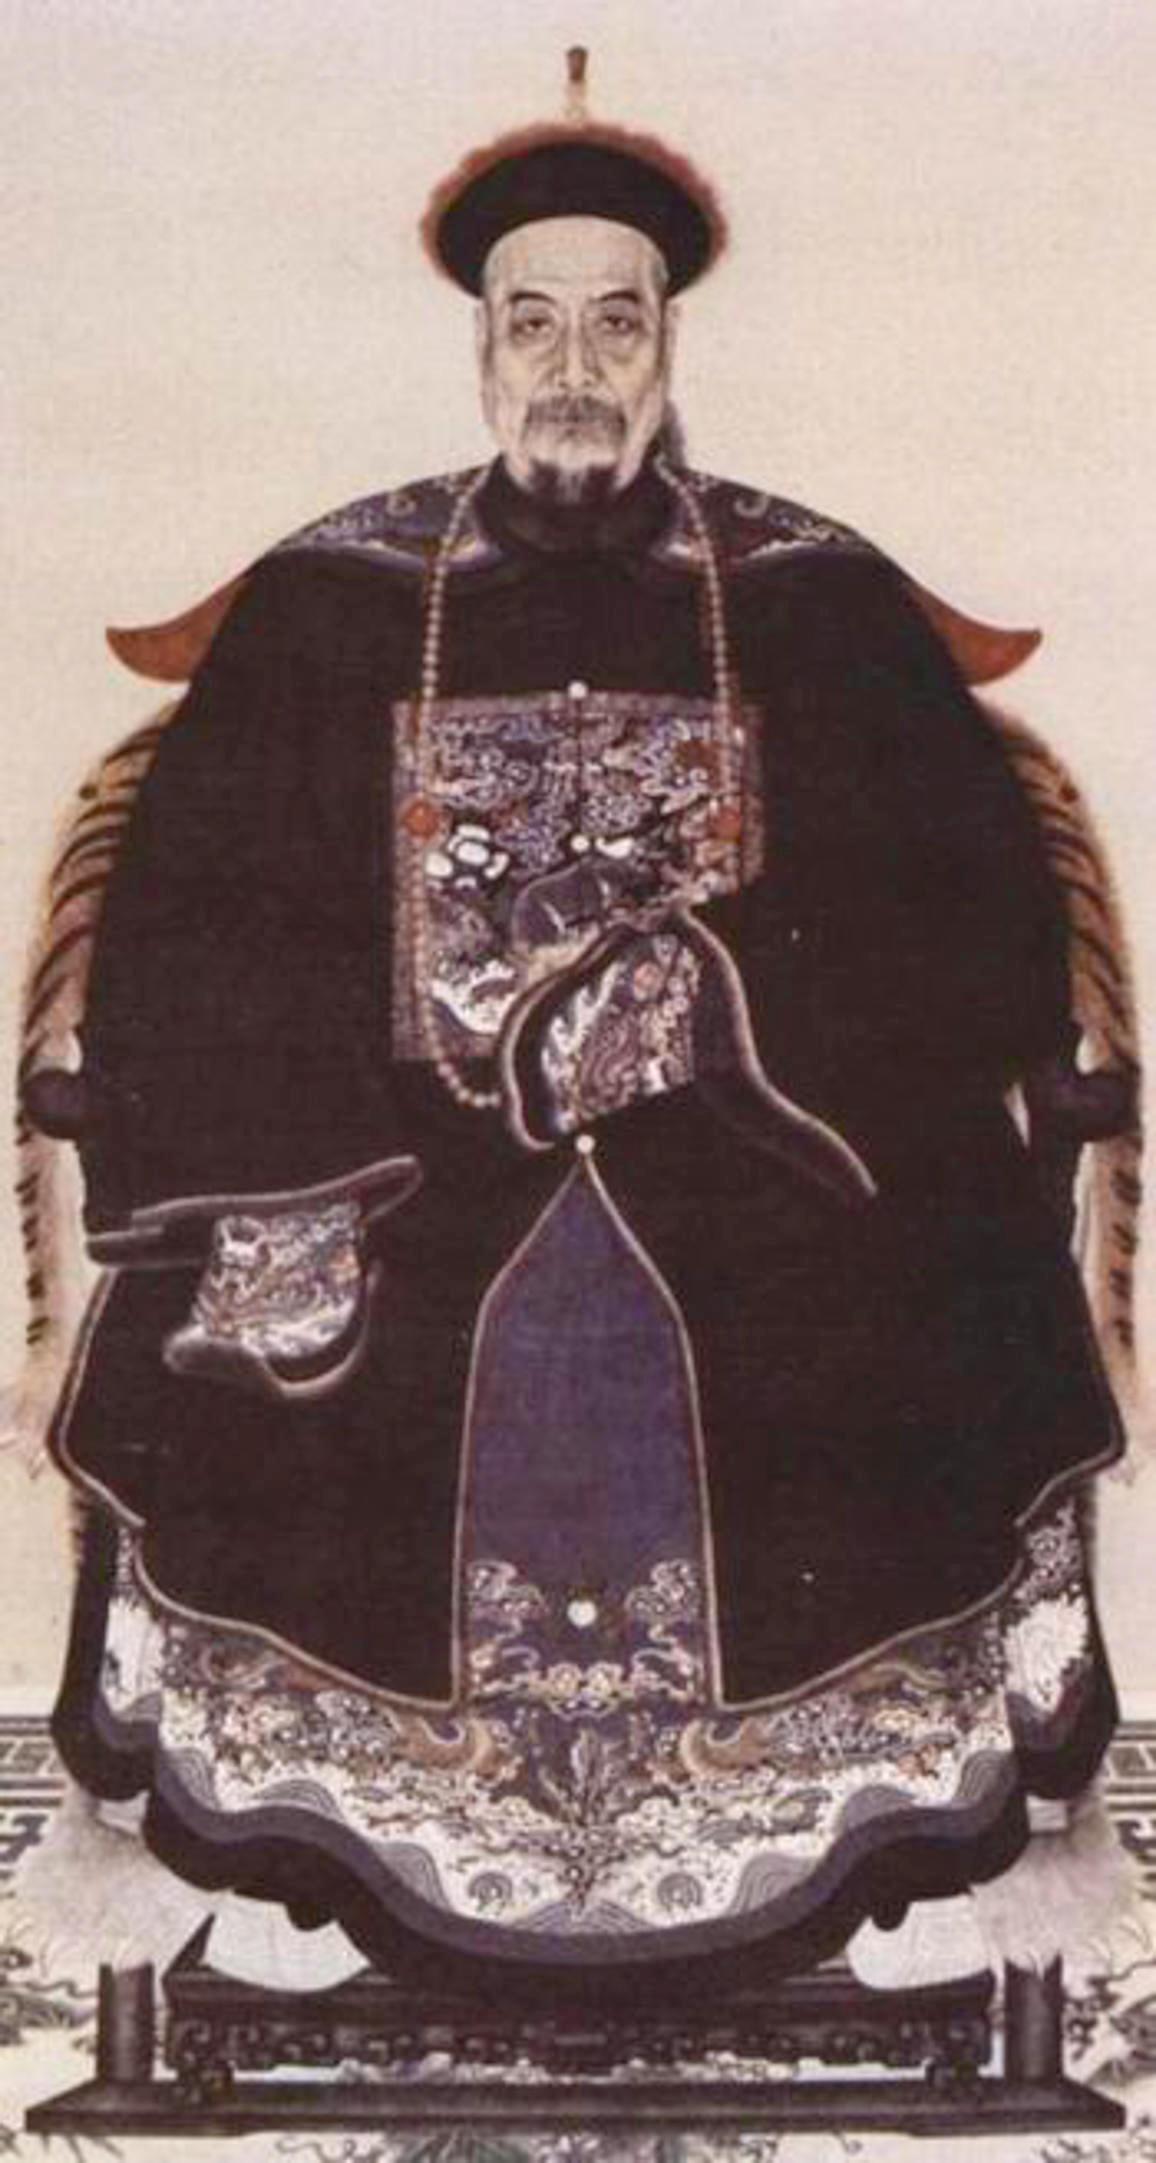 General Guan Tien Pui - Guan Tianpei   Commander of the Guangdong Water Force